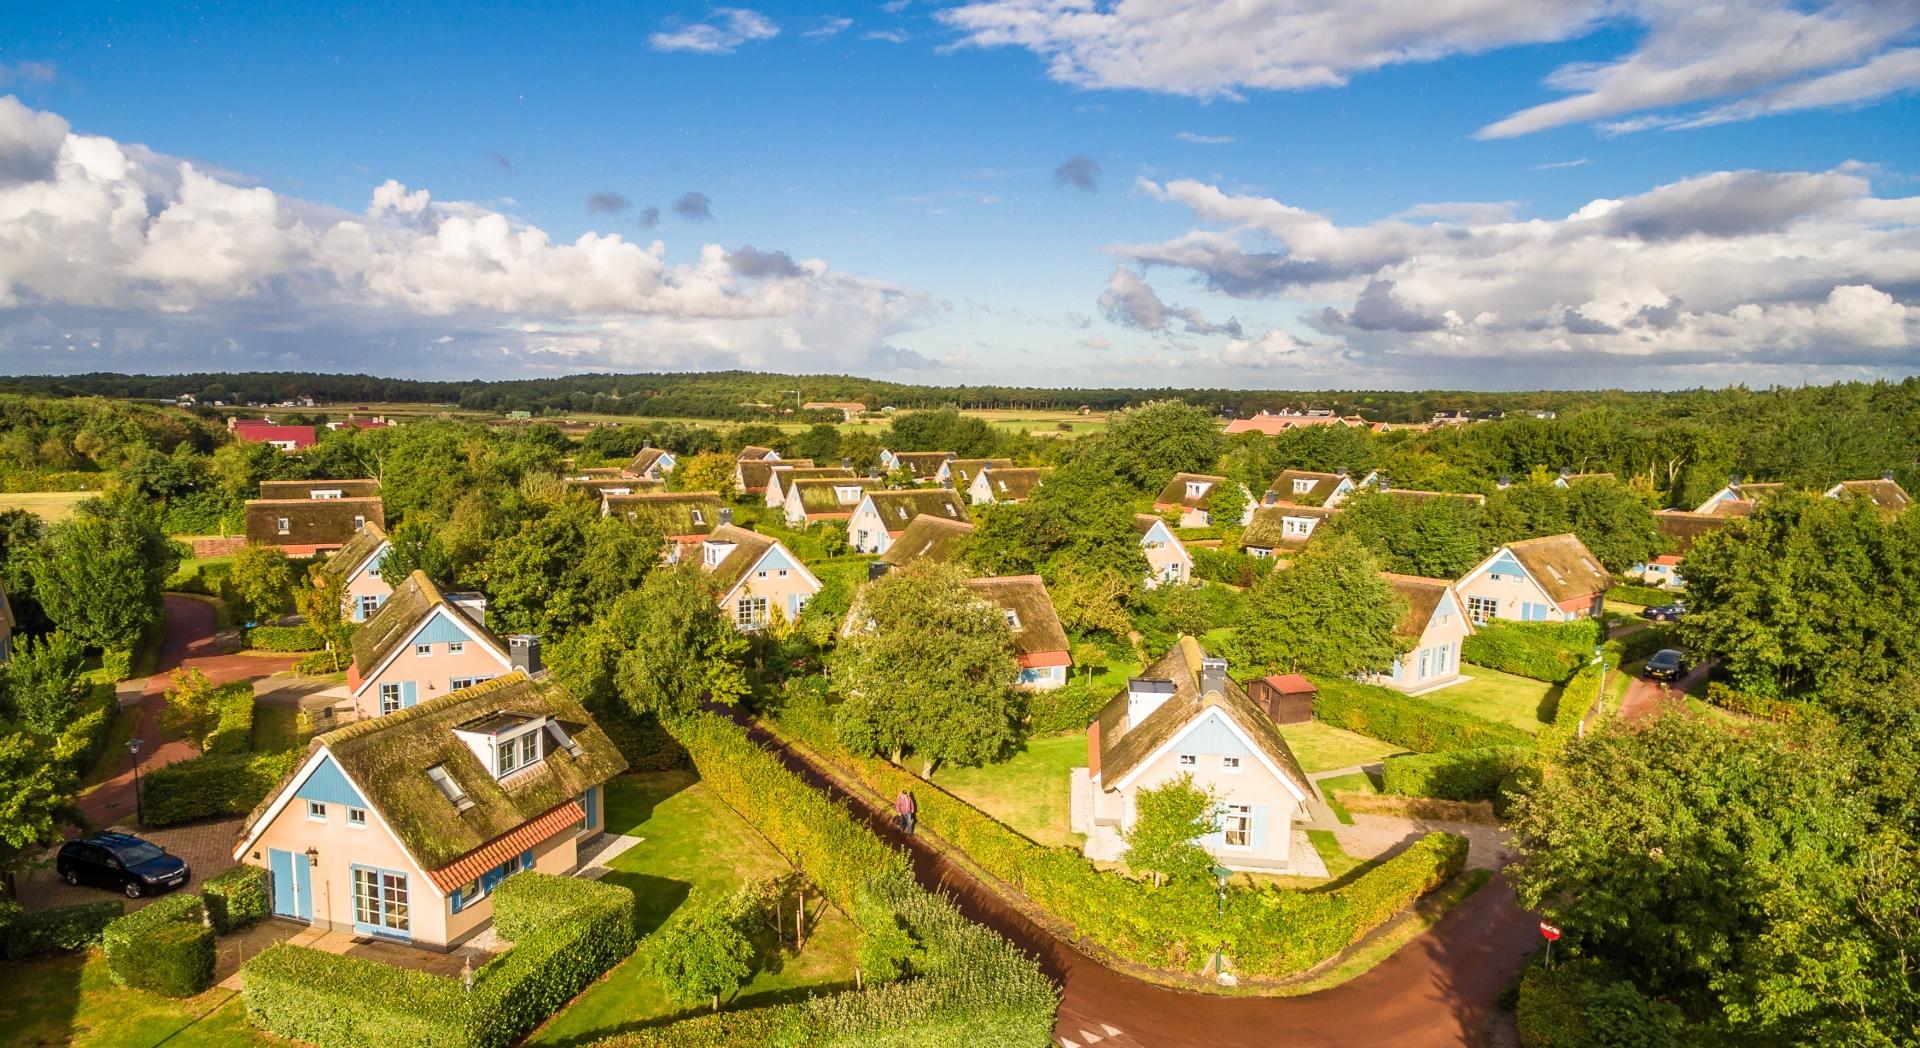 Vakantiedeal vakantiehuisje Kust Nederland 🏕️Roompot Kustpark Texel